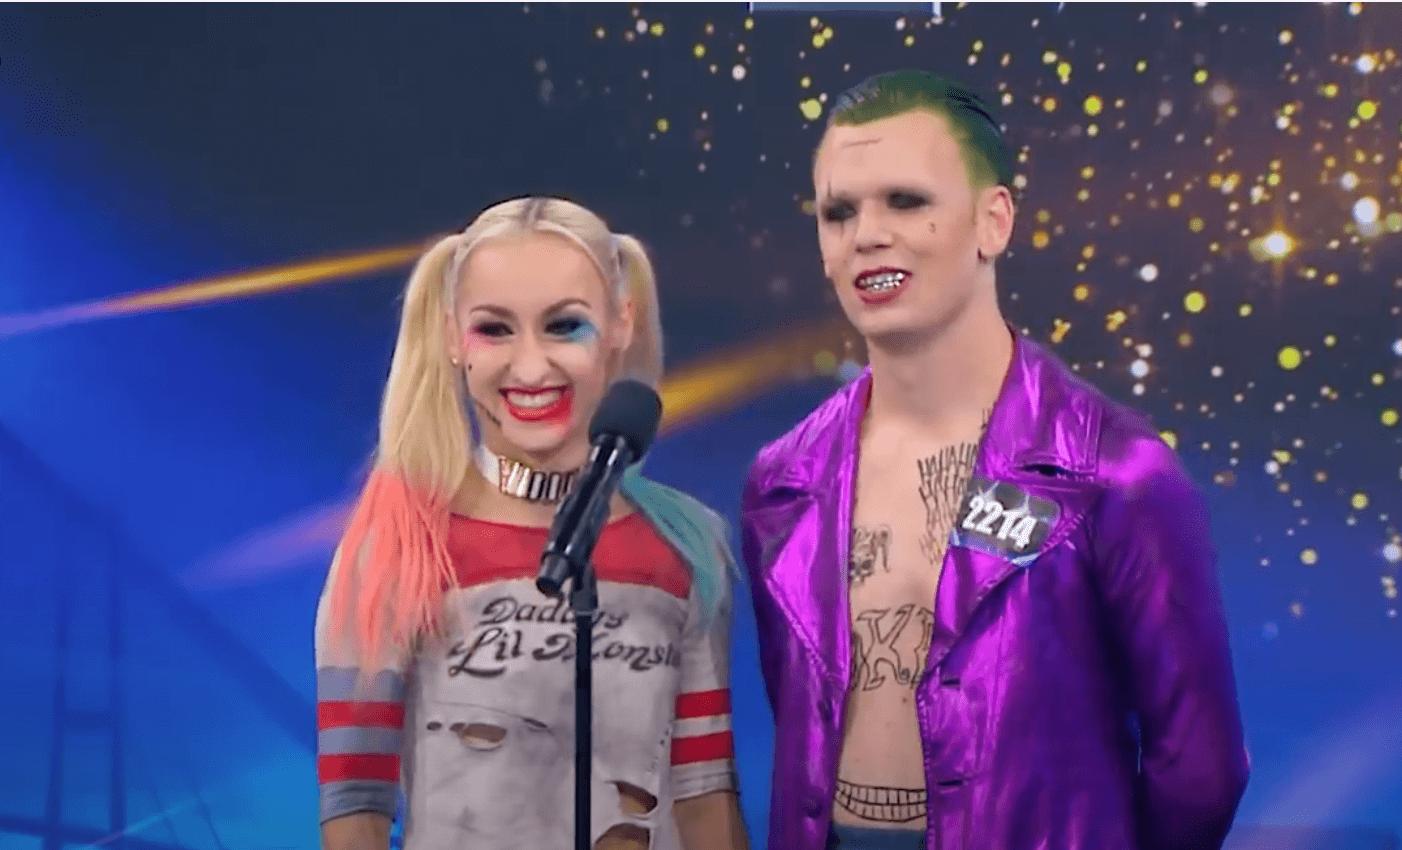 Denmarks-Got-Talent-The-Joker-Harley-Quinn-Nikolaj-Lund-Marta-Kocik